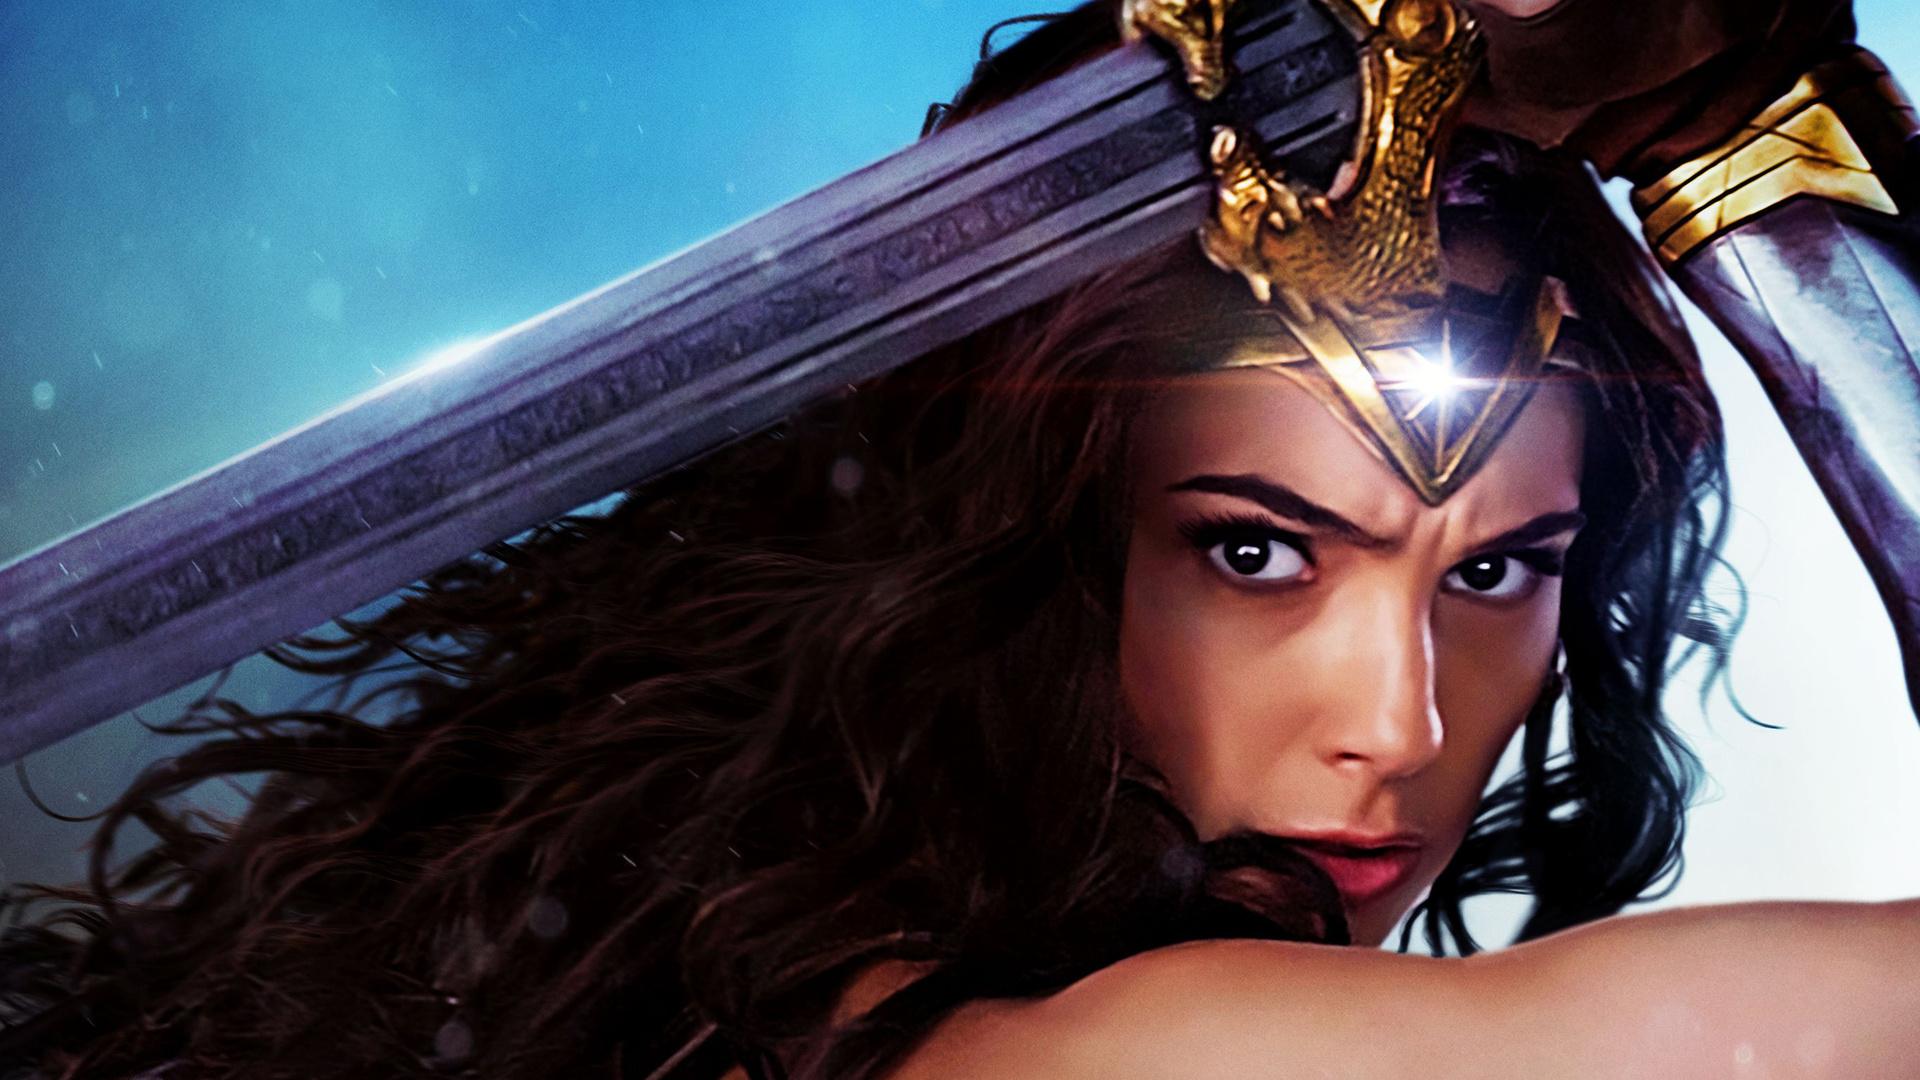 1920x1080 Gal Gadot Wonder Woman Movie 2017 Laptop Full HD ... Hd Wallpapers 1920x1080 Women